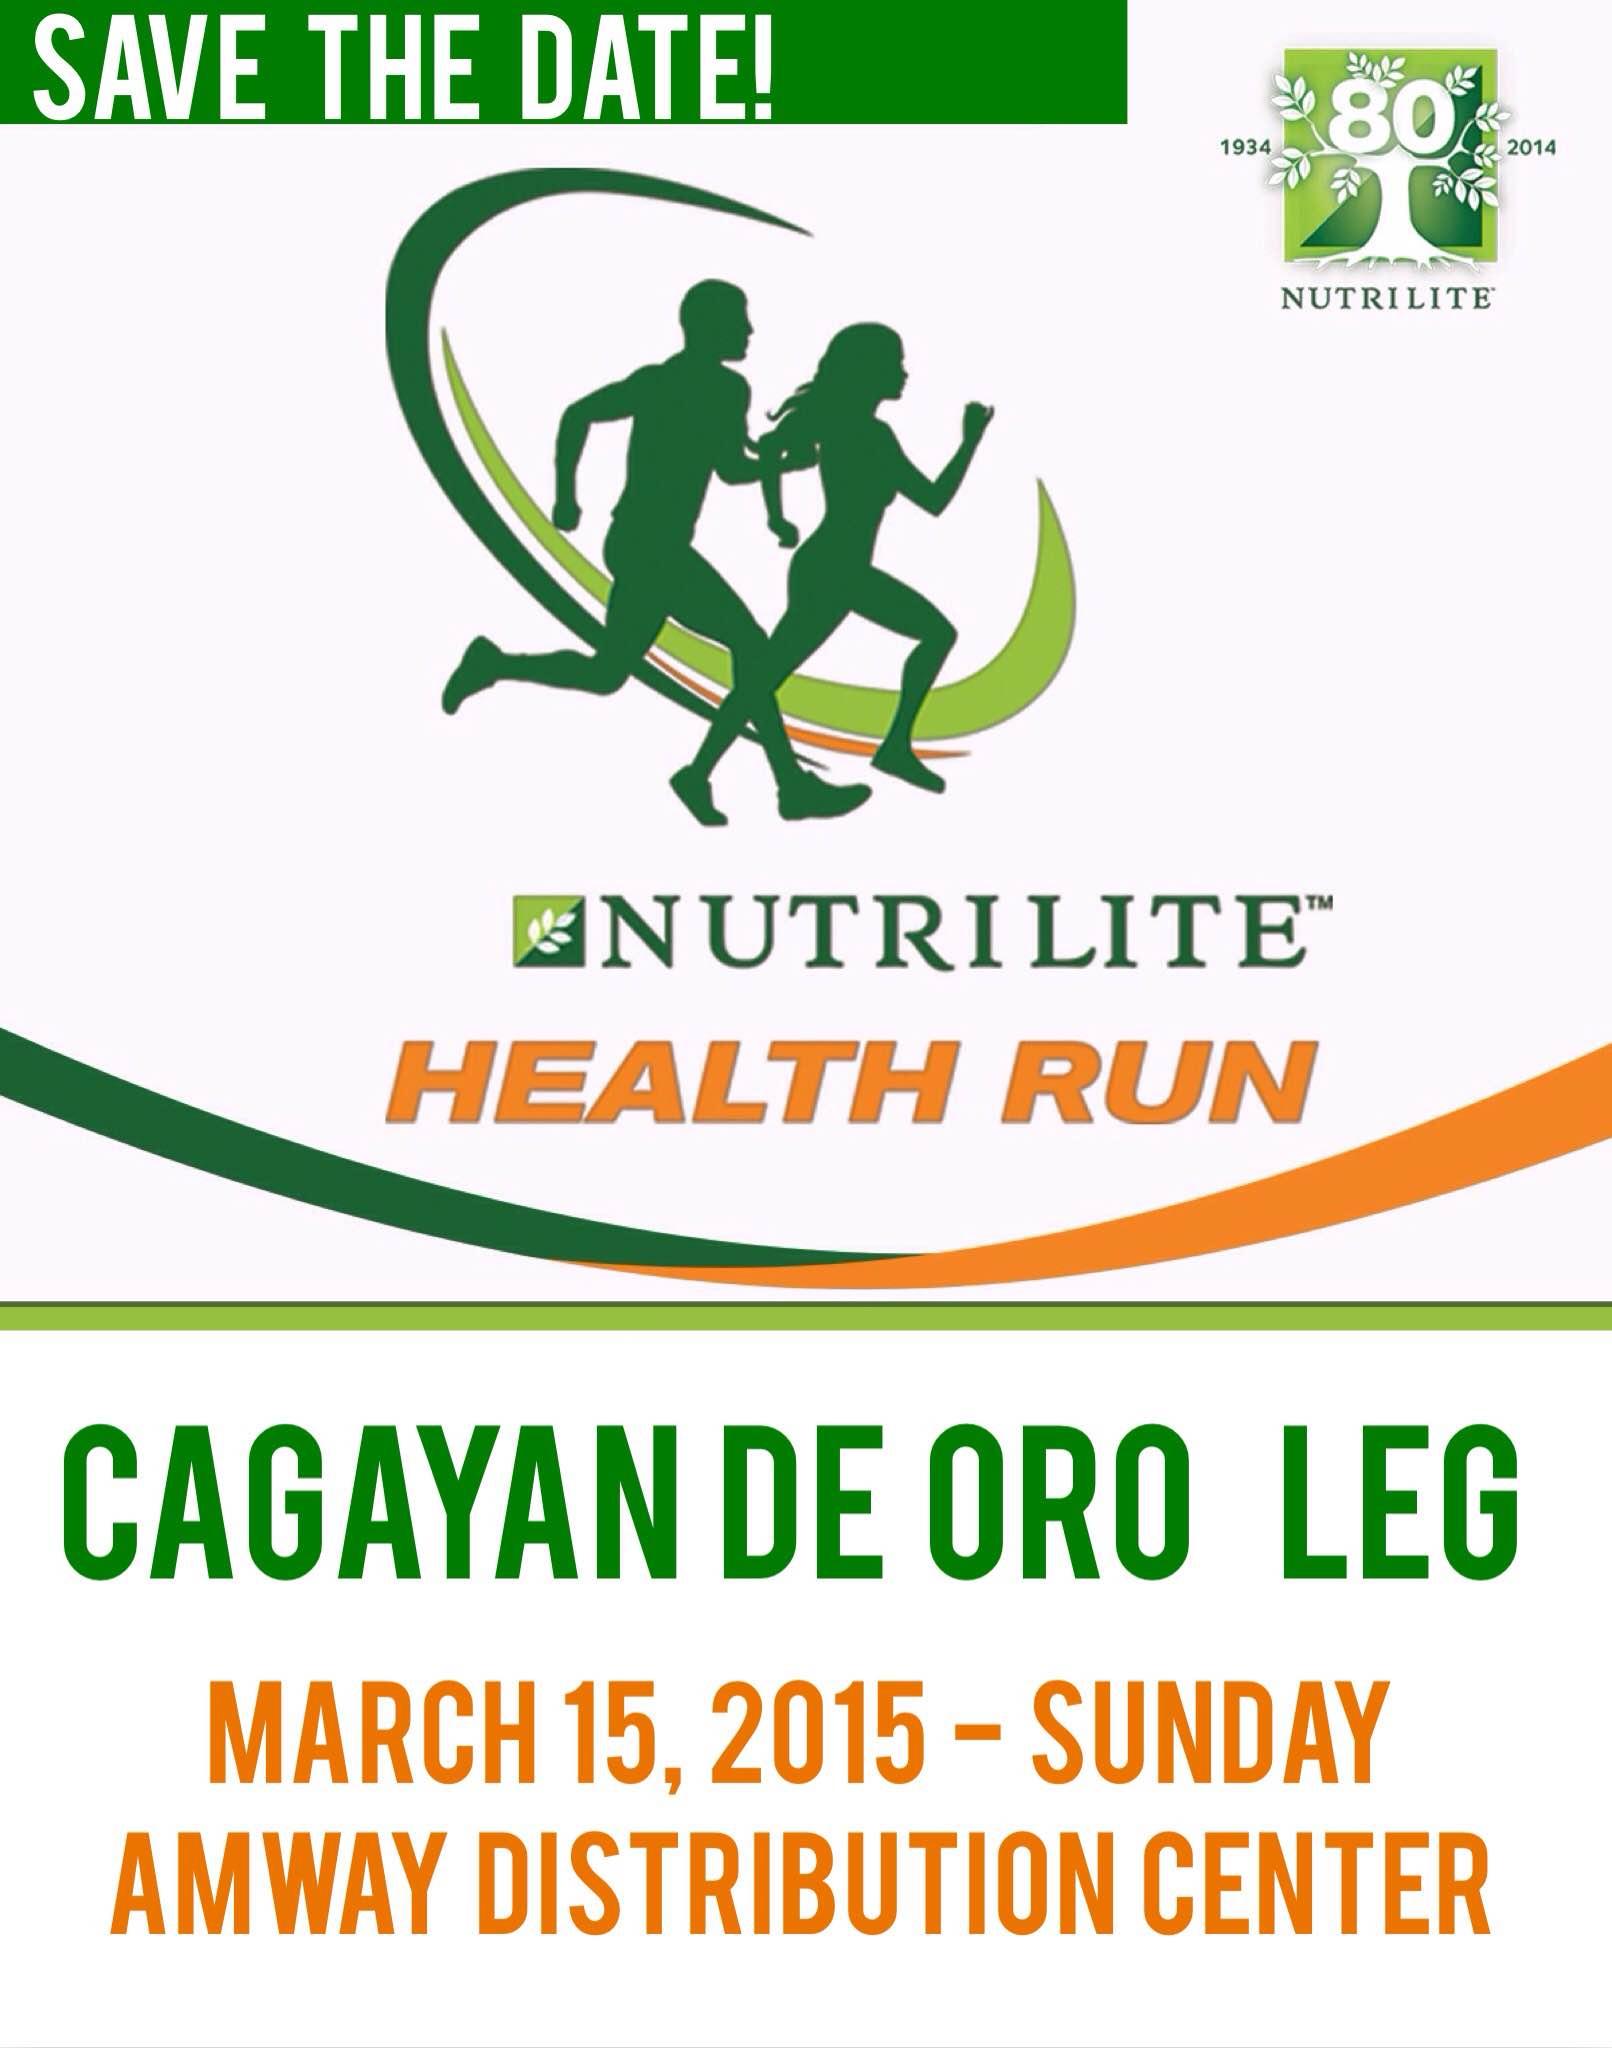 Amway Nutrilite Health Run 2015 in CDO